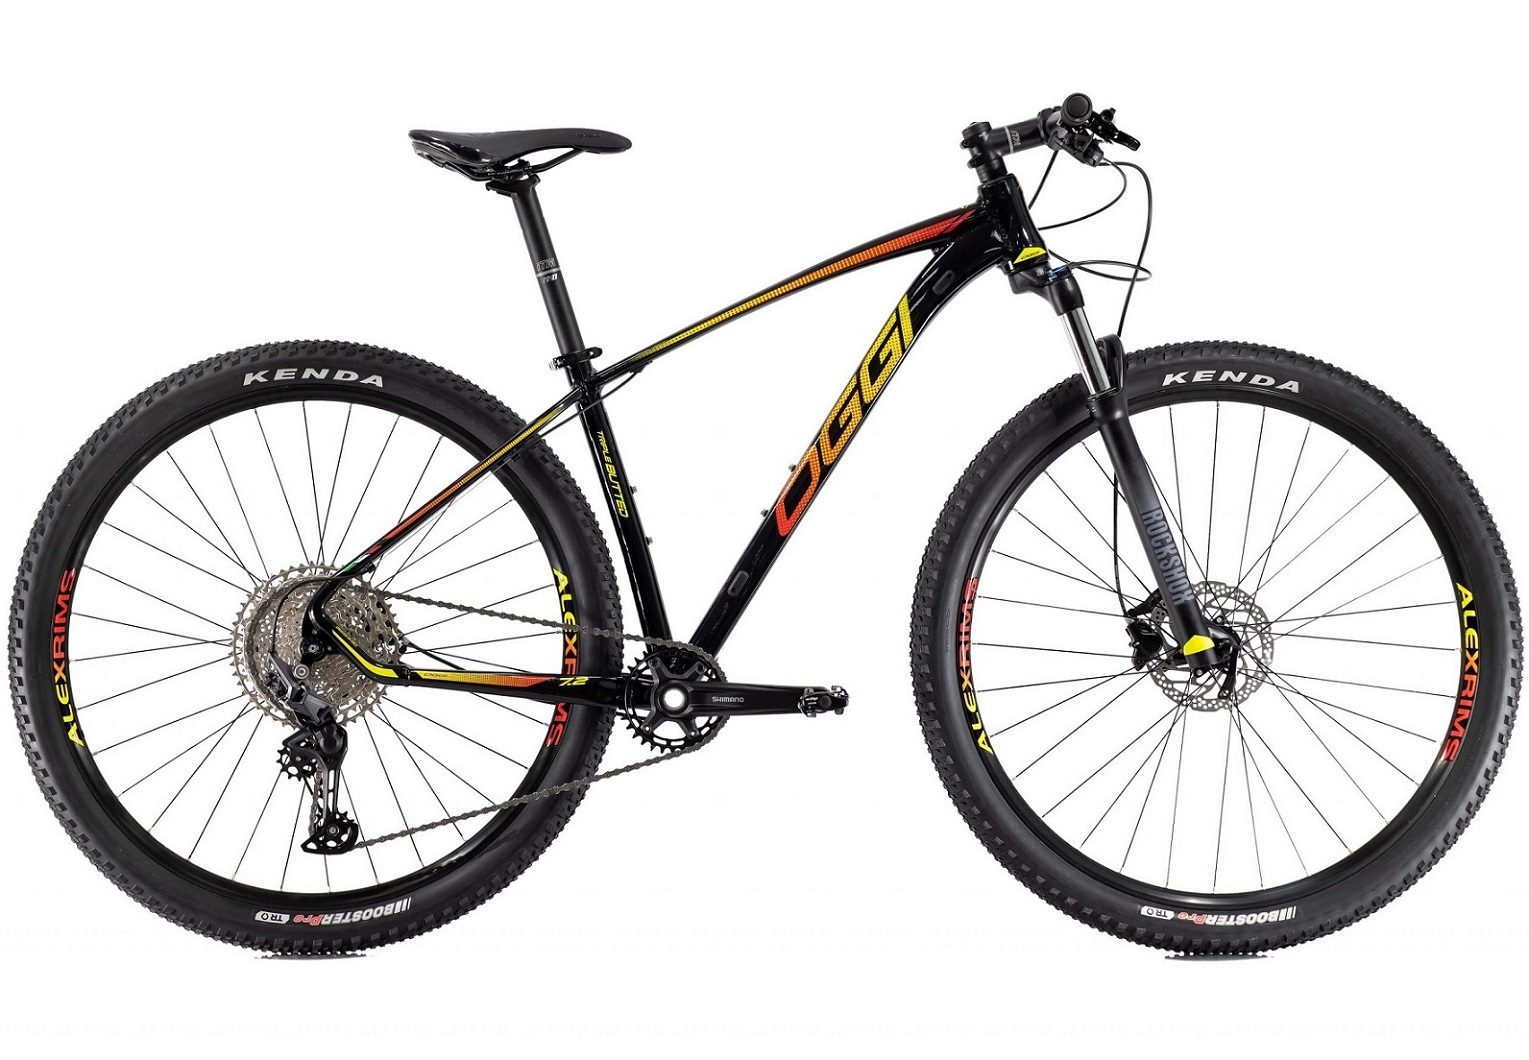 BICICLETA 29 OGGI BIG WHEEL 7.2 DEORE M5100 1X11V. PTO/VM/AMAR (2022)